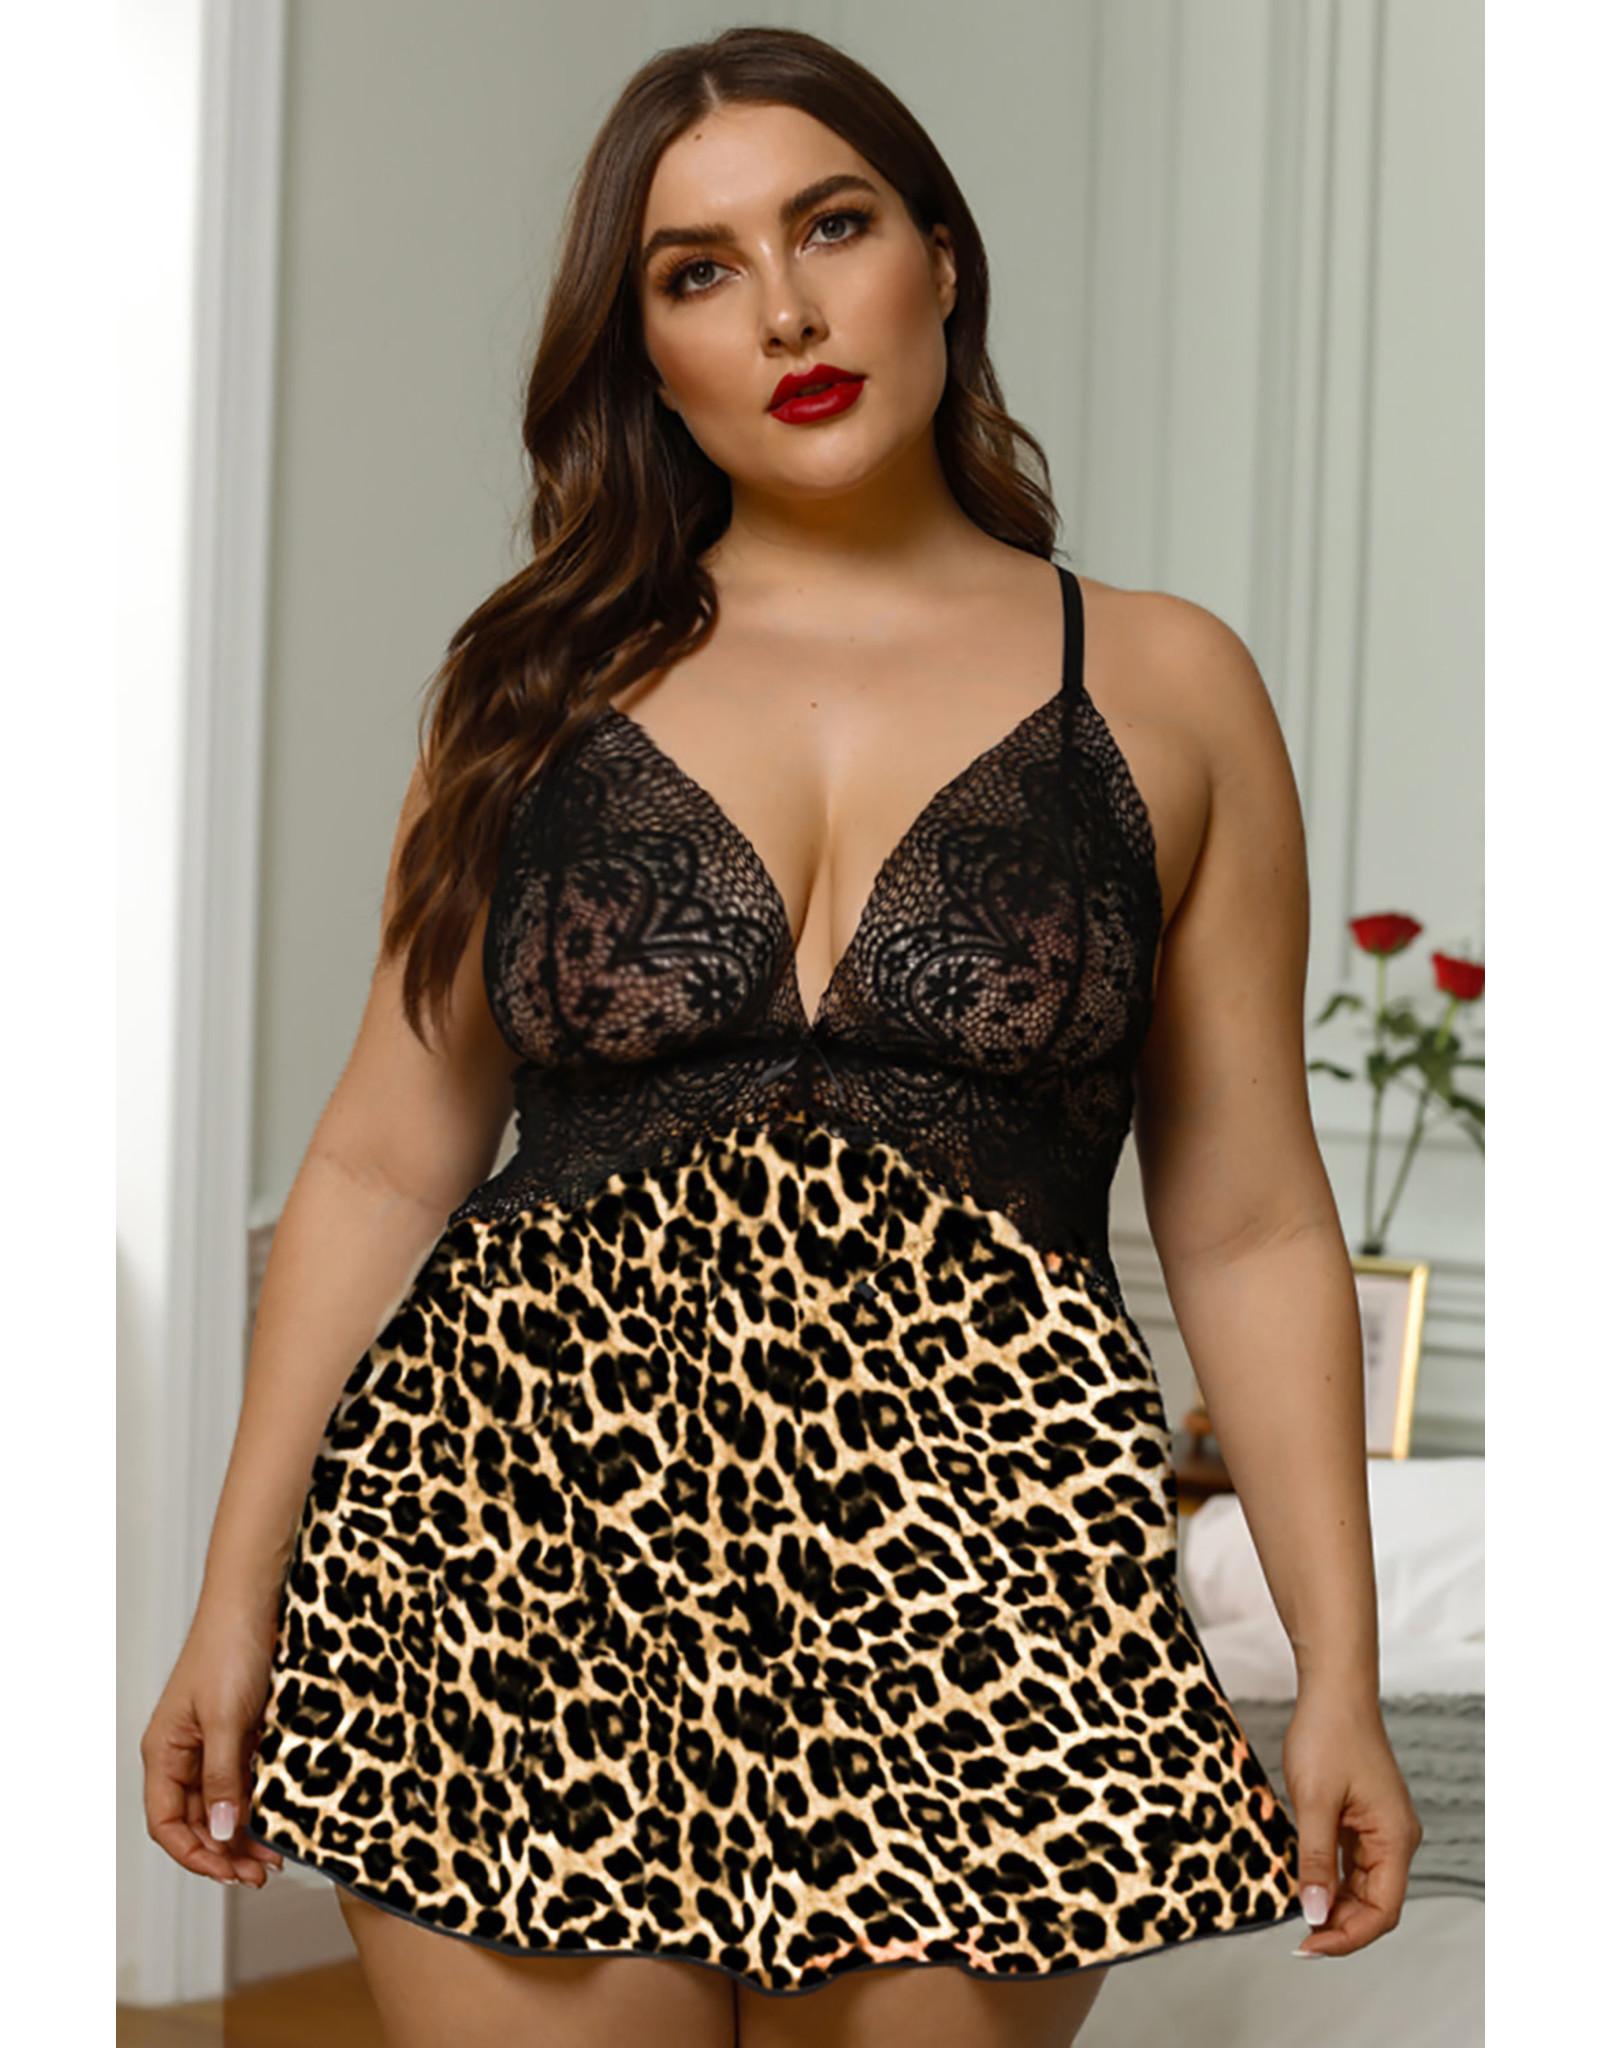 Babylon Cheetah Crochet Lace Backless Cami 1X